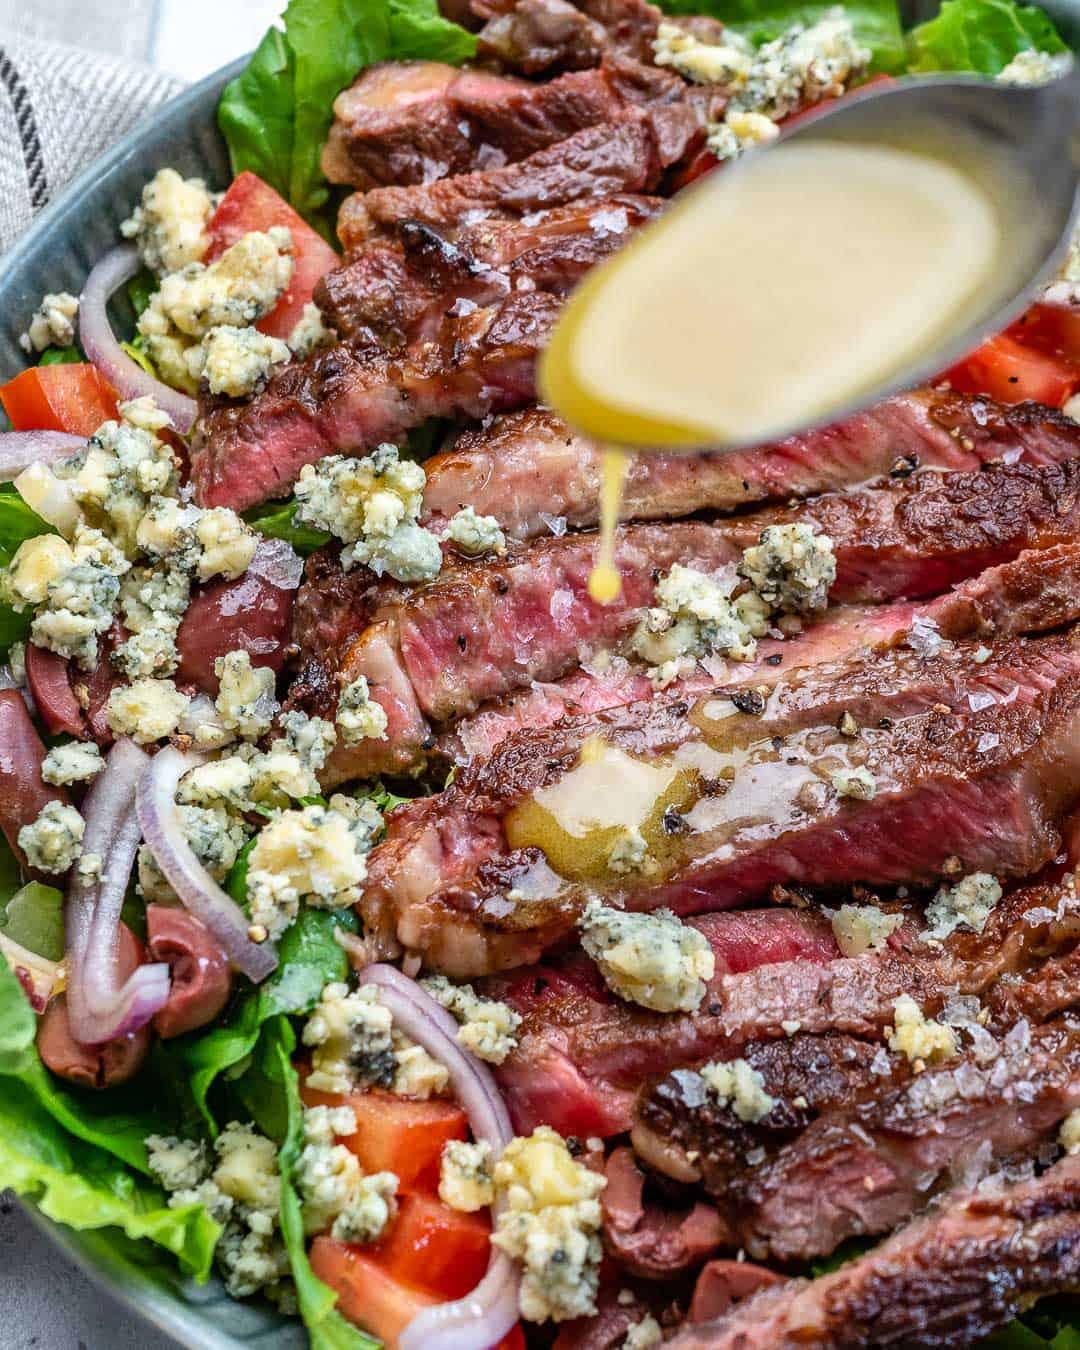 spooning dressing on Steak Salad Recipe